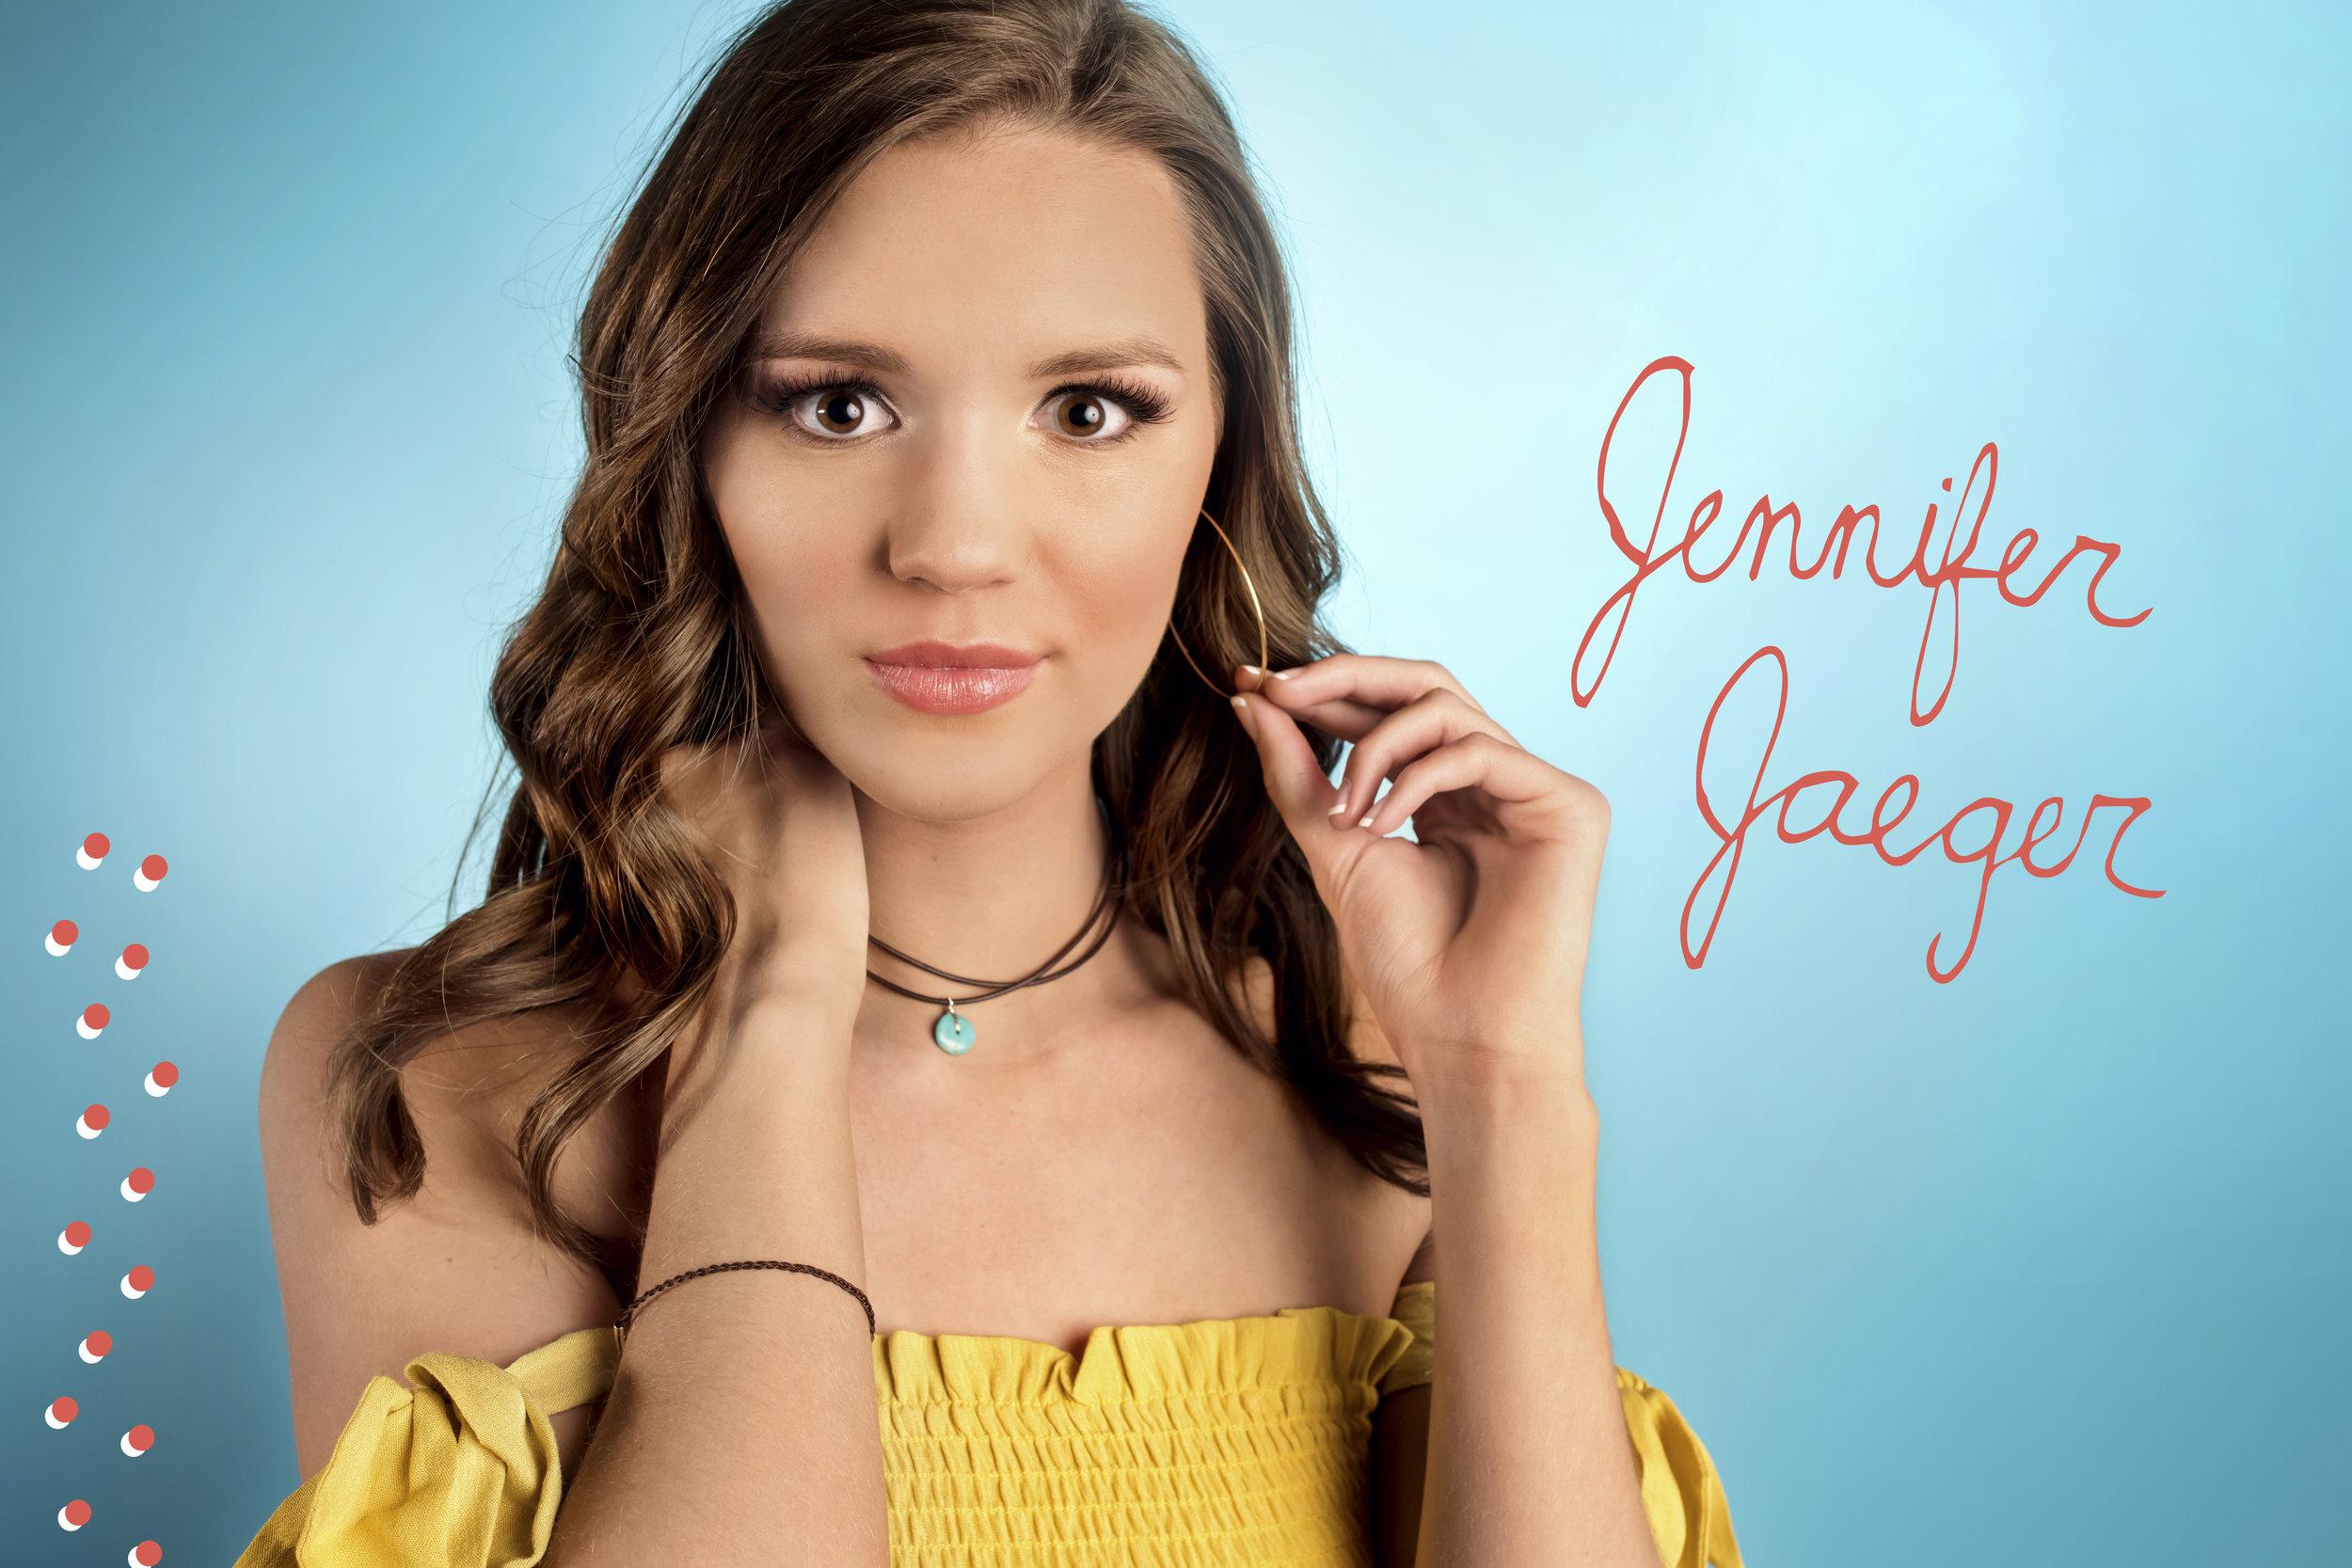 Jennifer -